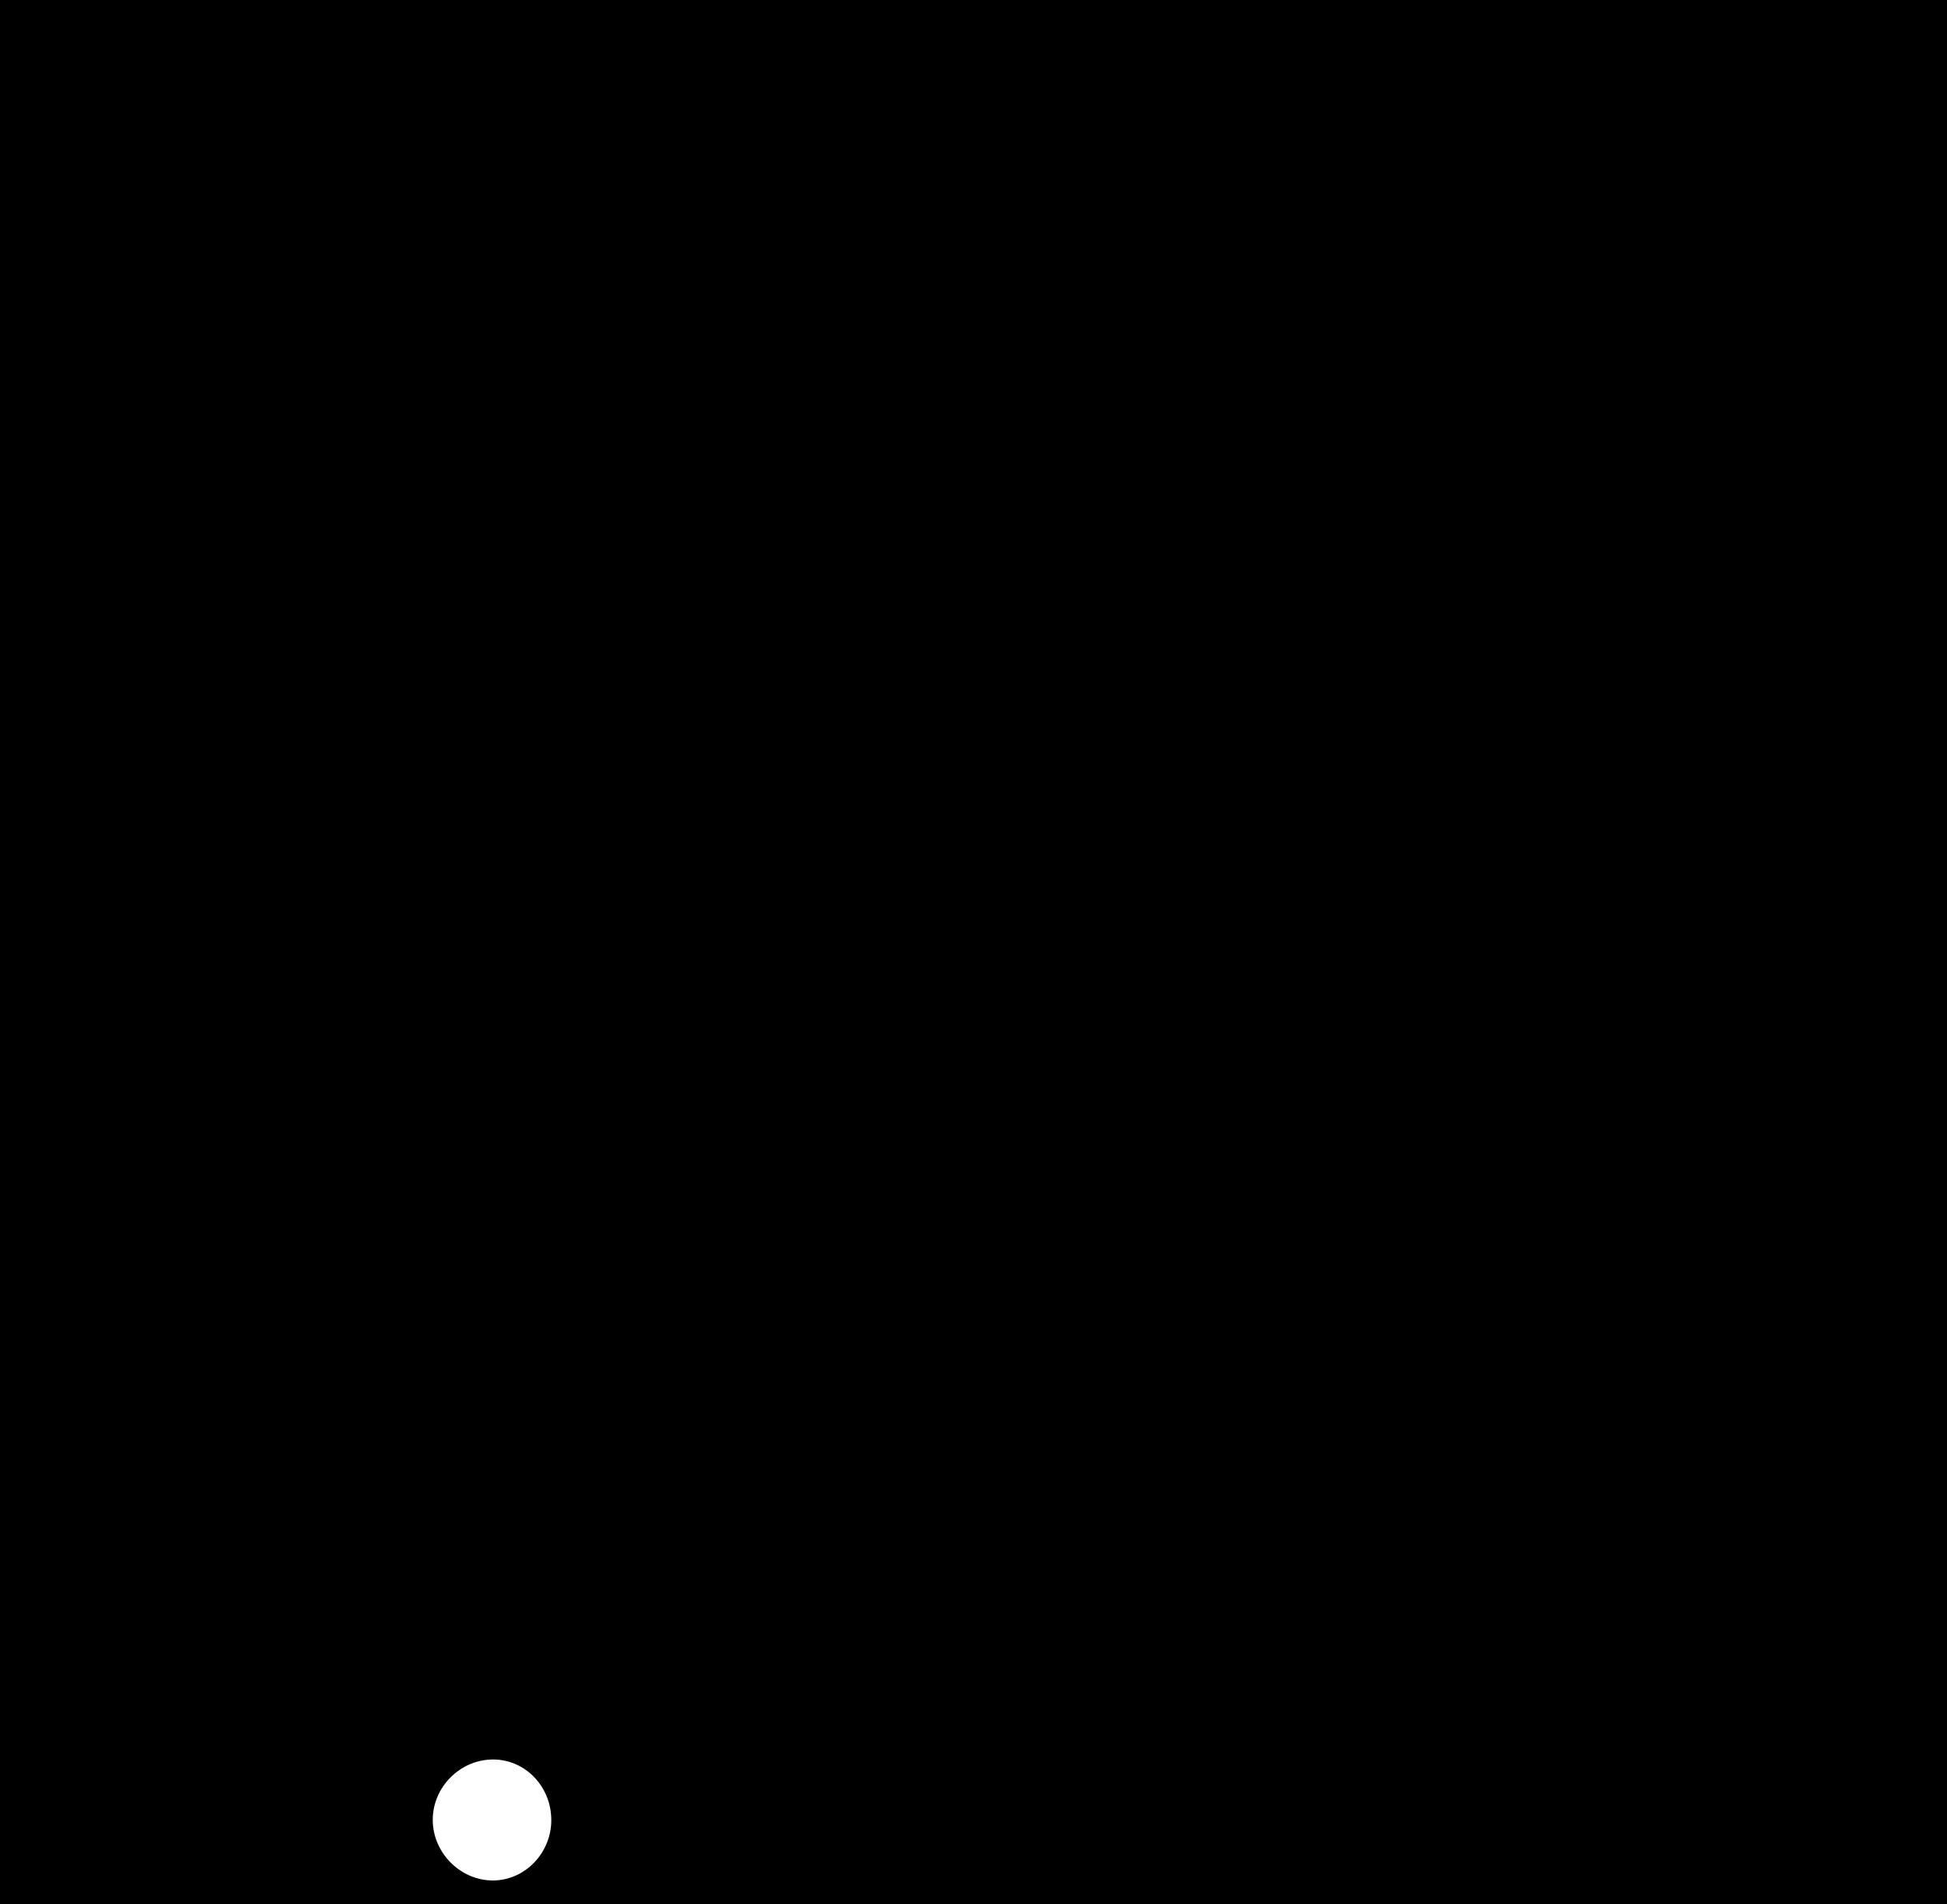 calvin-klein-logo-png-transparent